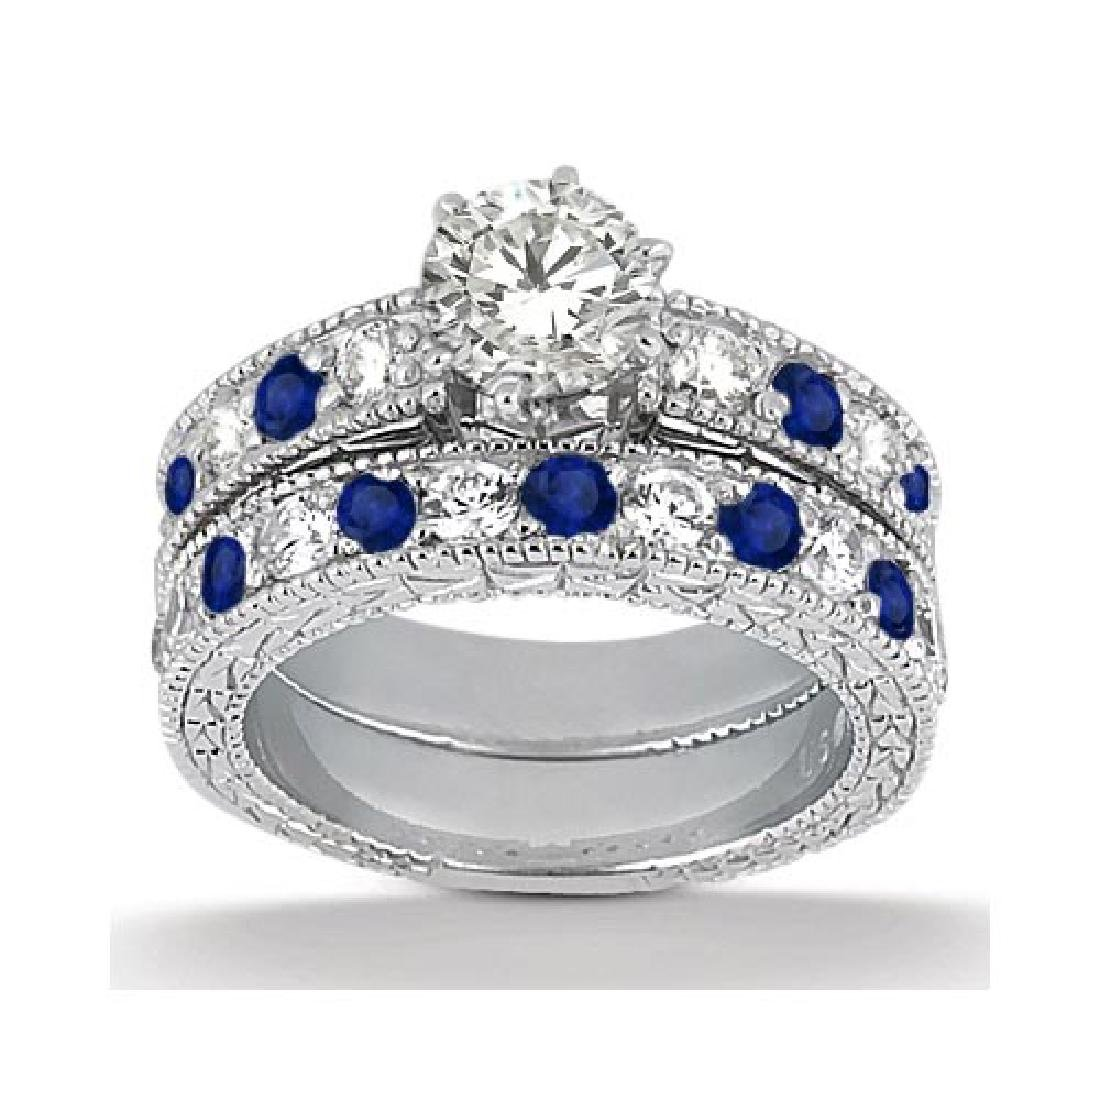 Antique Diamond and Blue Sapphire Bridal Set 14k White